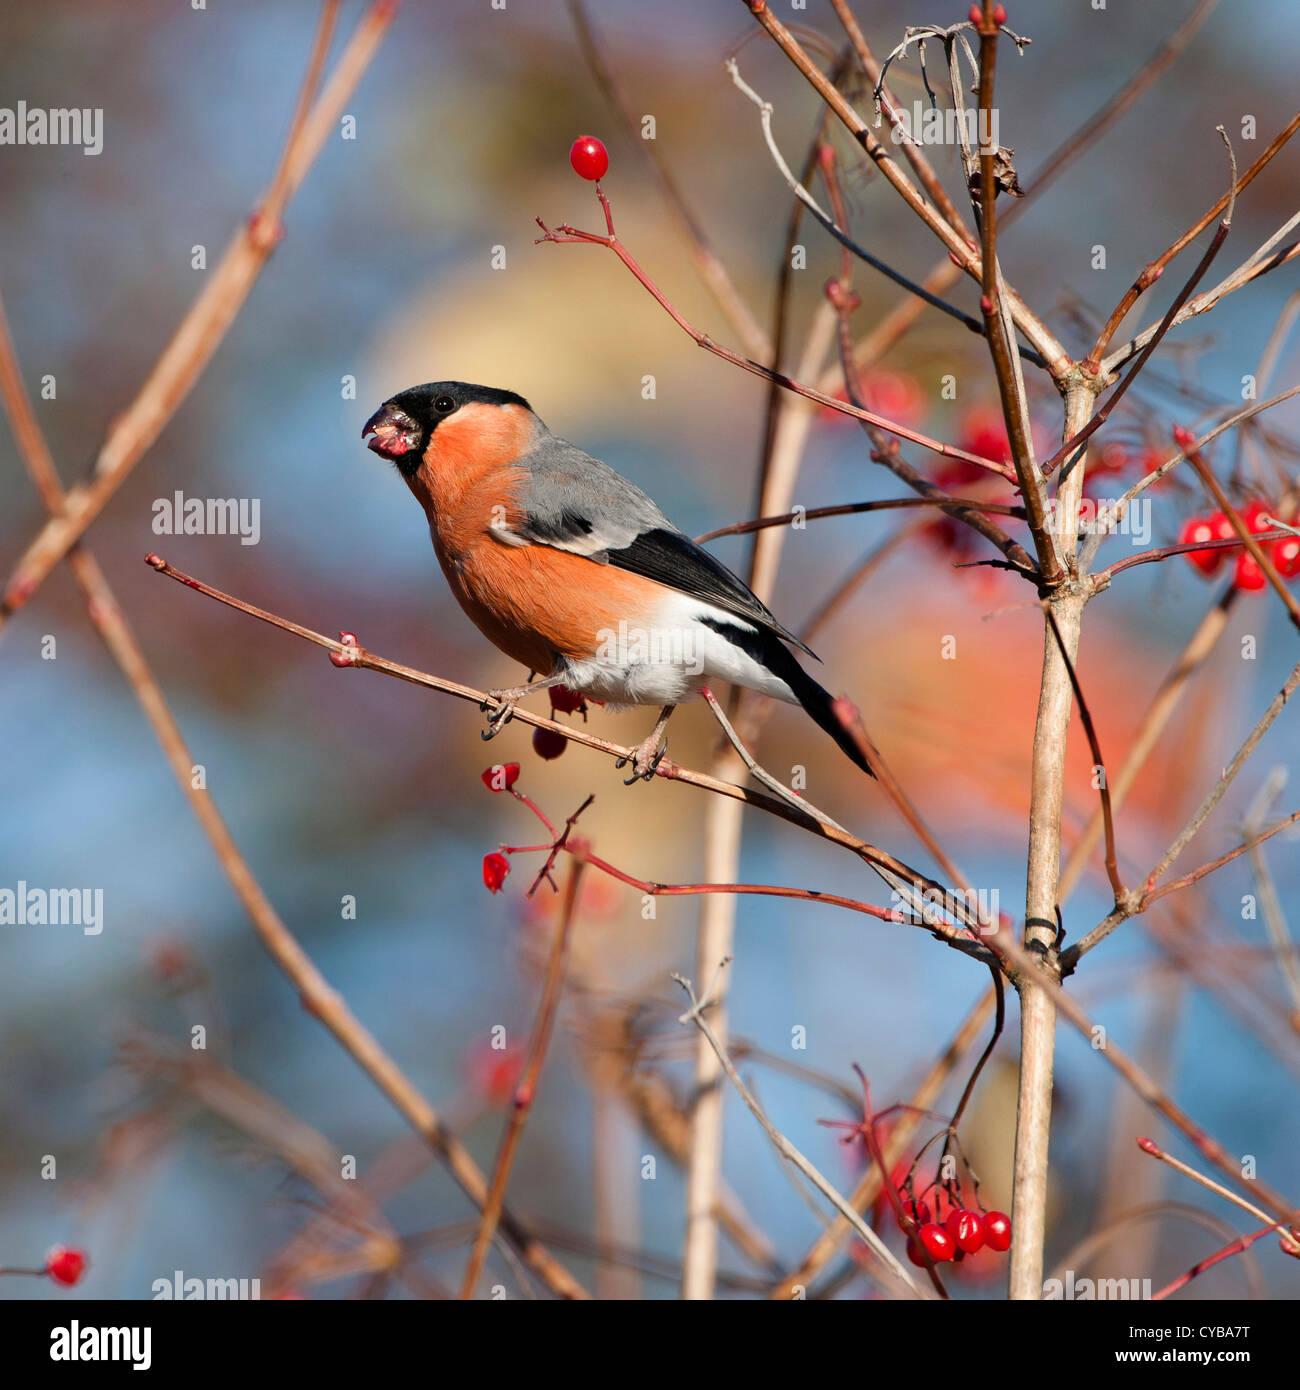 Bullfinch (Pyrrhula pyrrhula) separating and eating (mandibulating) the seed from the fleshy berry of guilder rose - Stock Image